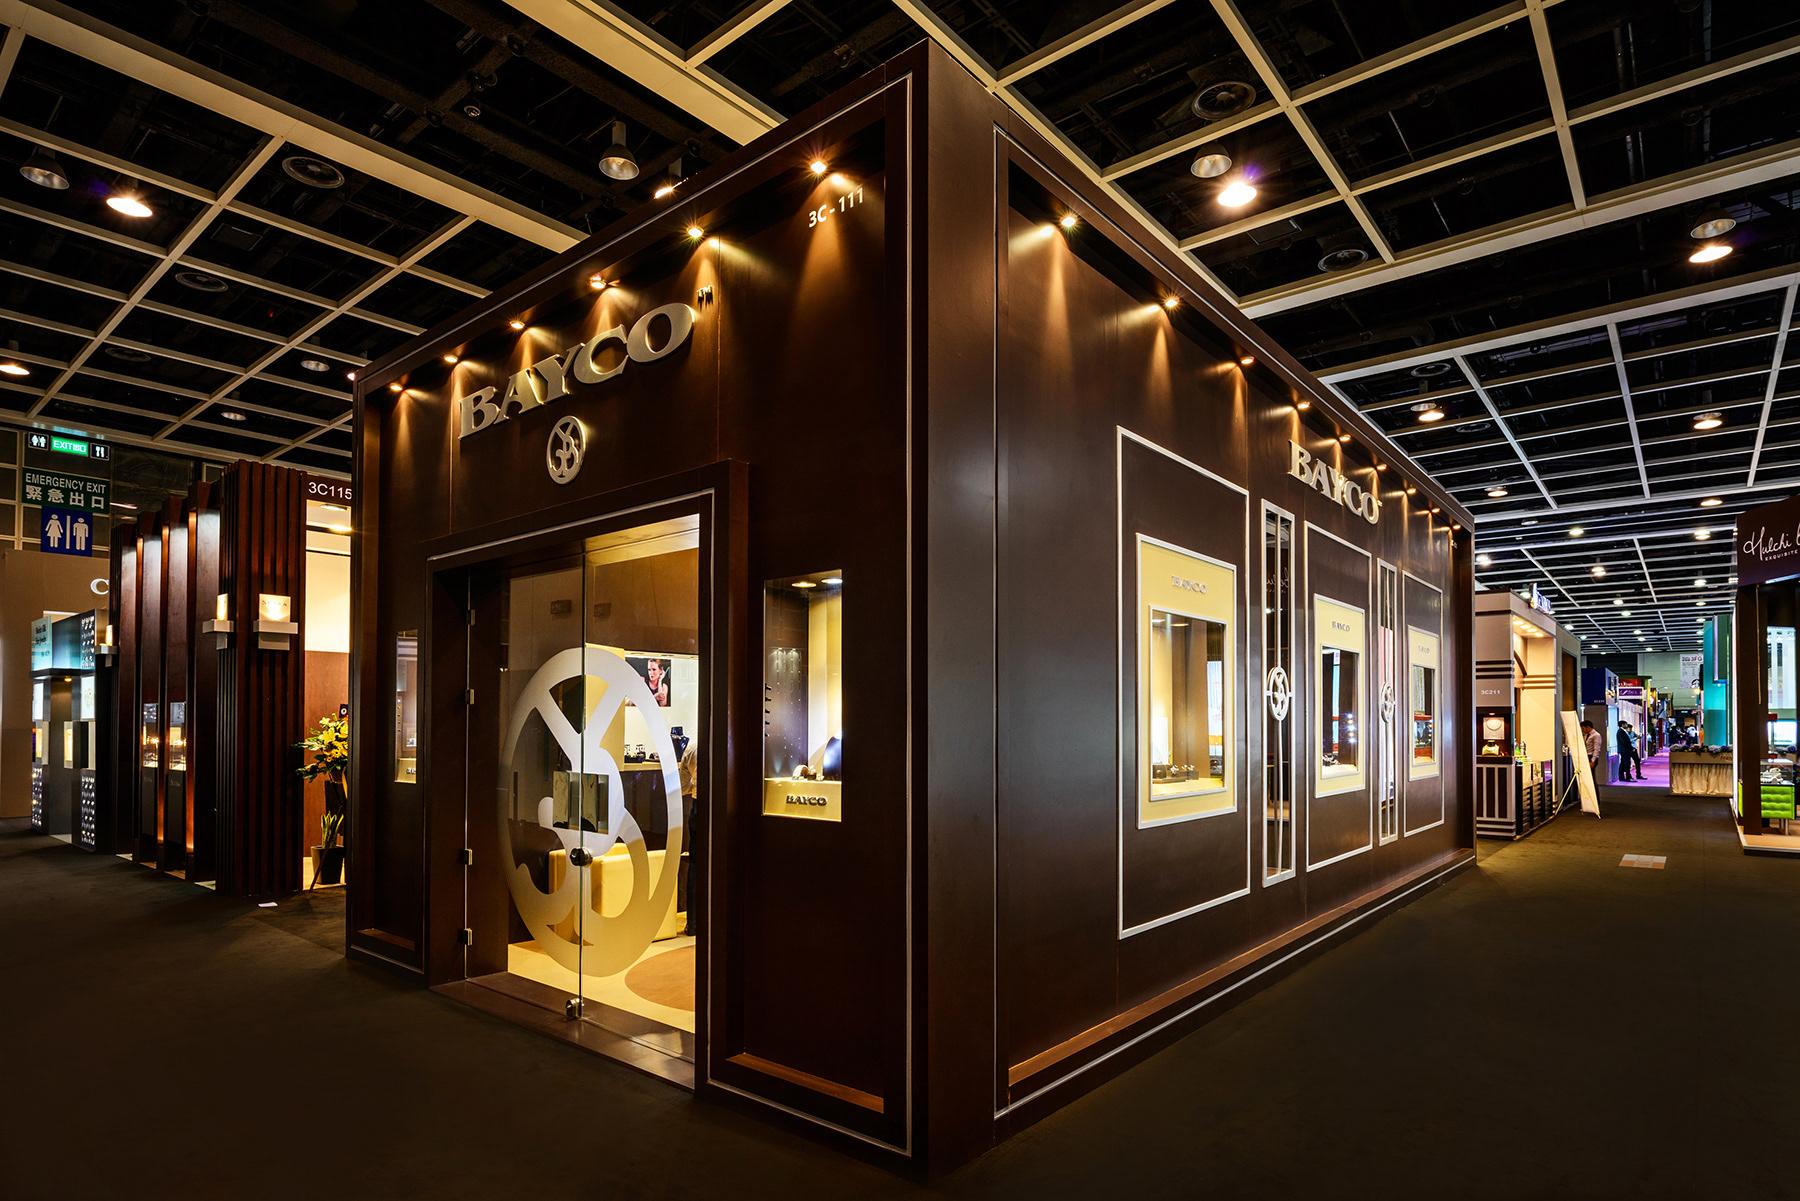 Exhibition Stand Design Hong Kong : Fln media production 泛濤媒體製作公司 interior & set up